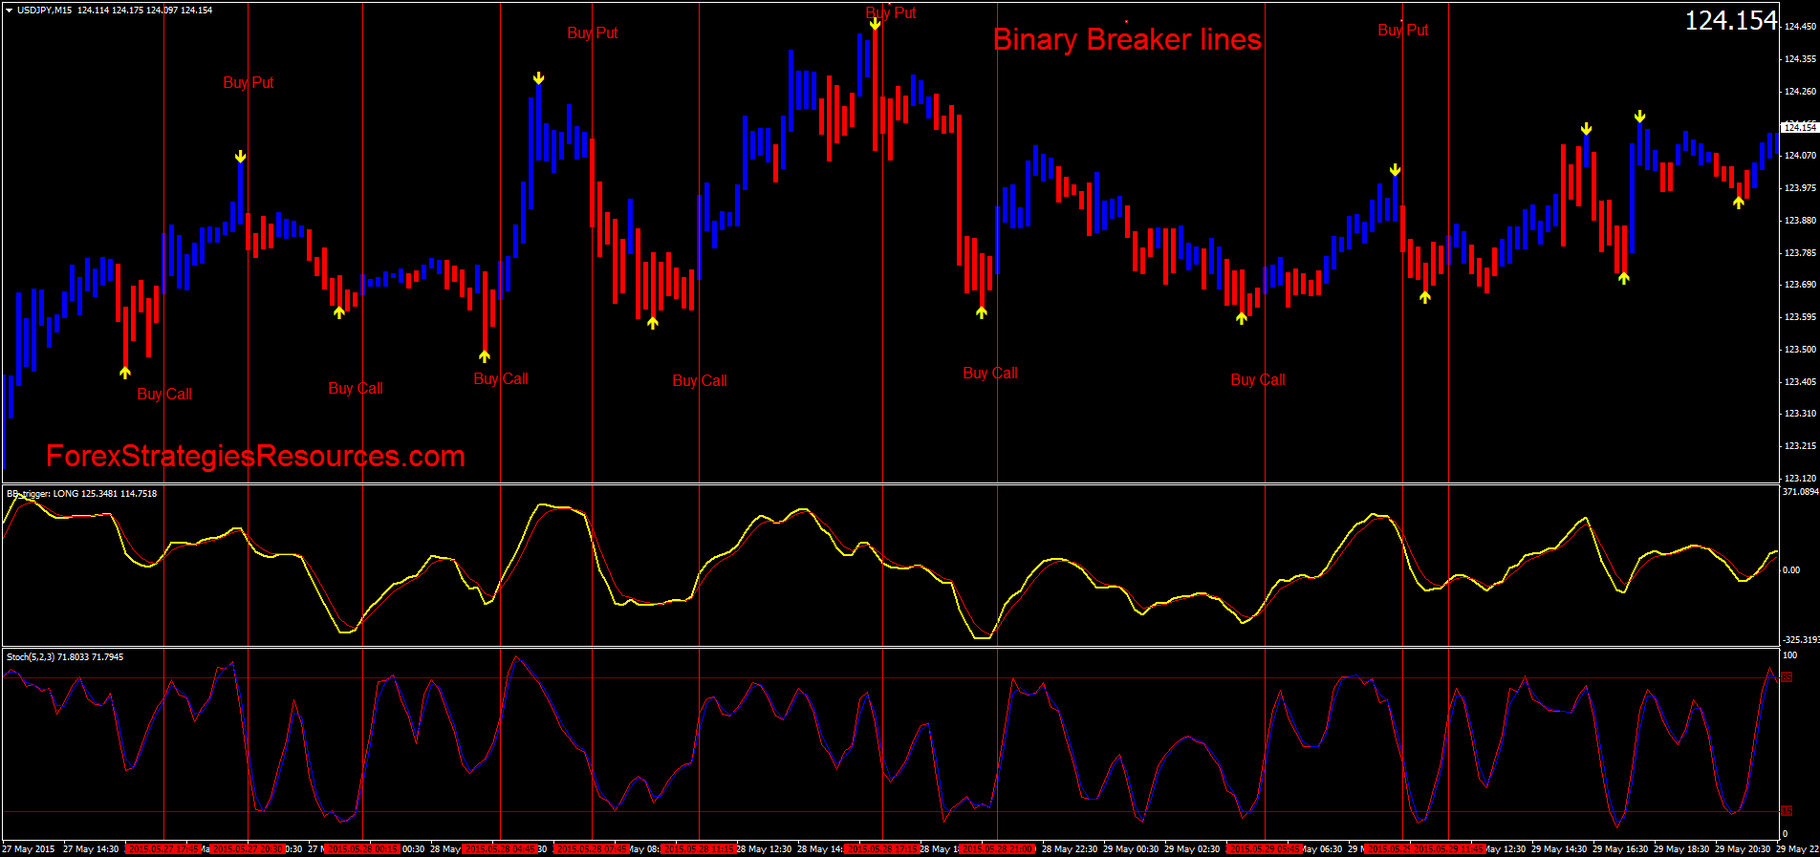 Forex and binary broker